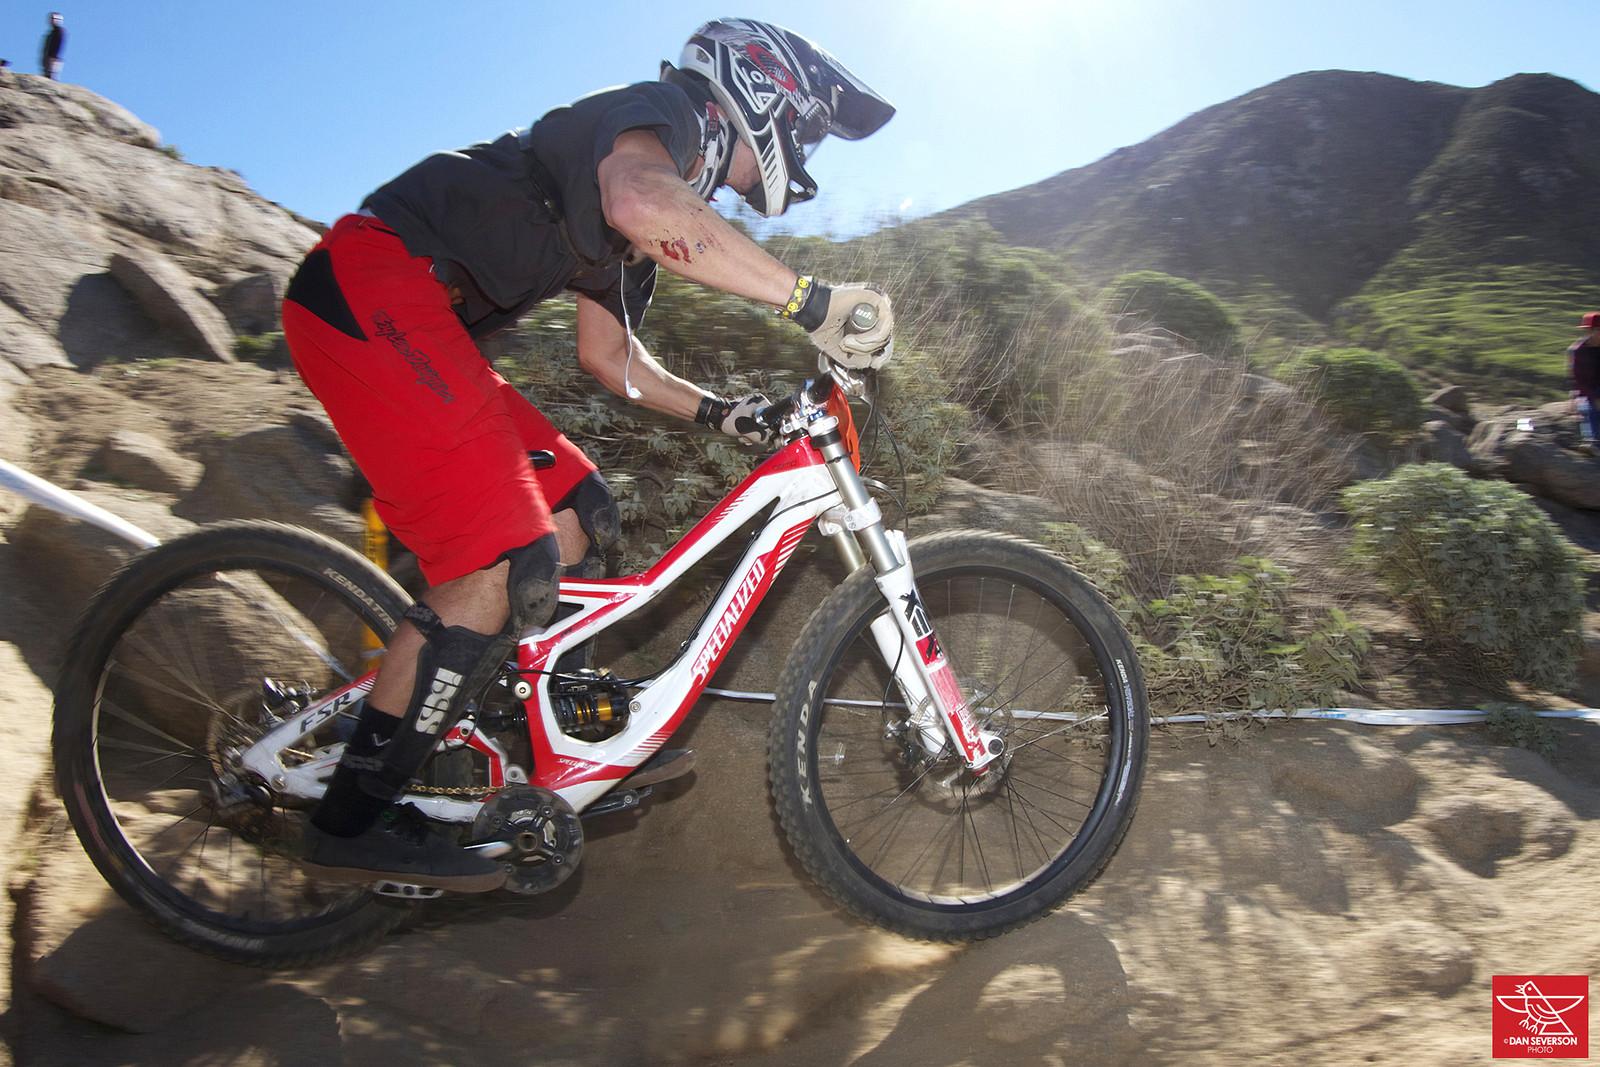 IMG 2509 - danseverson photo - Mountain Biking Pictures - Vital MTB